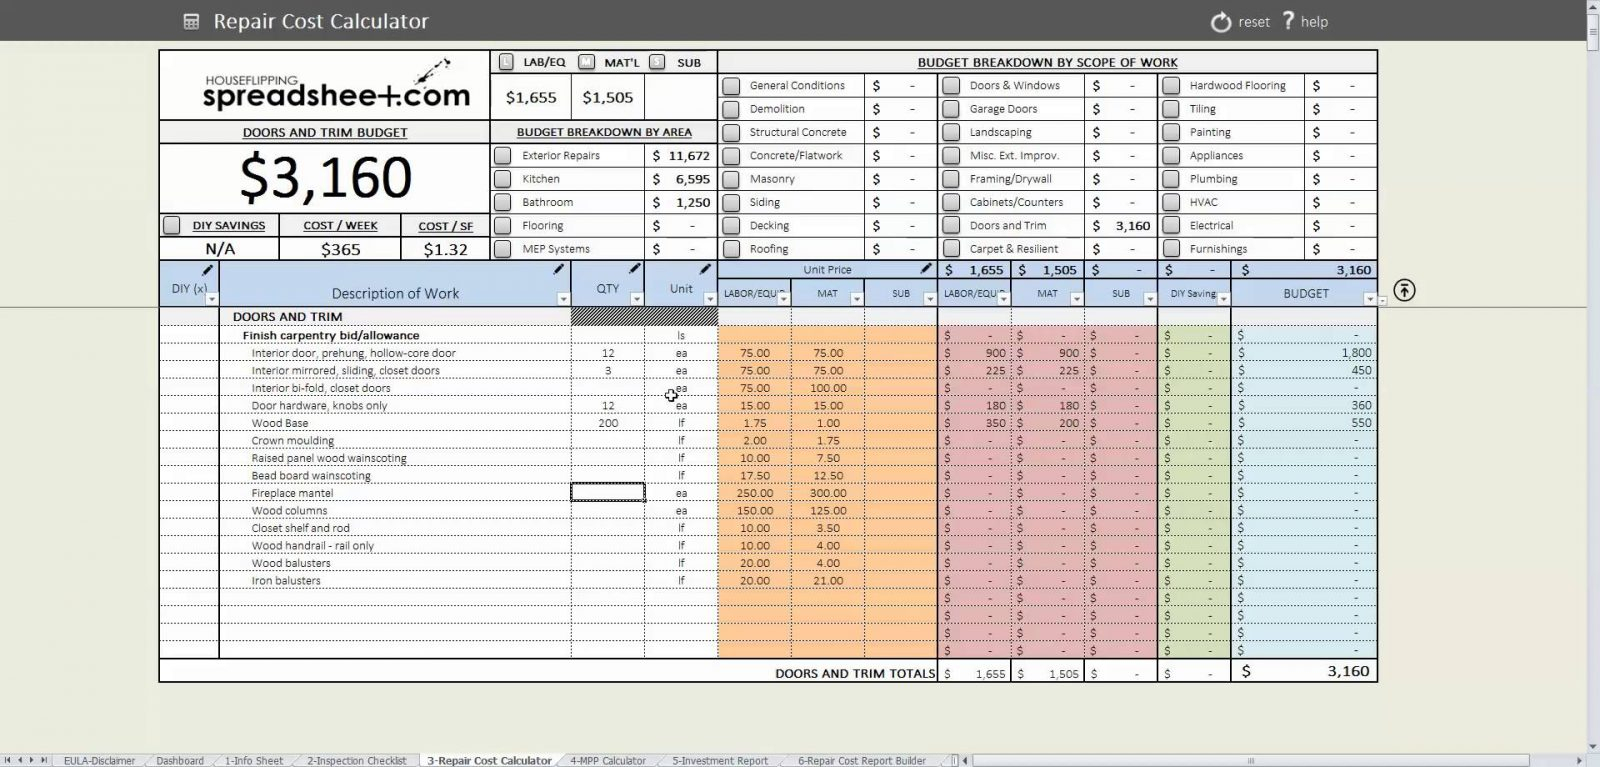 House Flipping Spreadsheet Template Regarding Housepping Spreadsheet Templateppingdsheet Fix Np Rehab Analyzer For